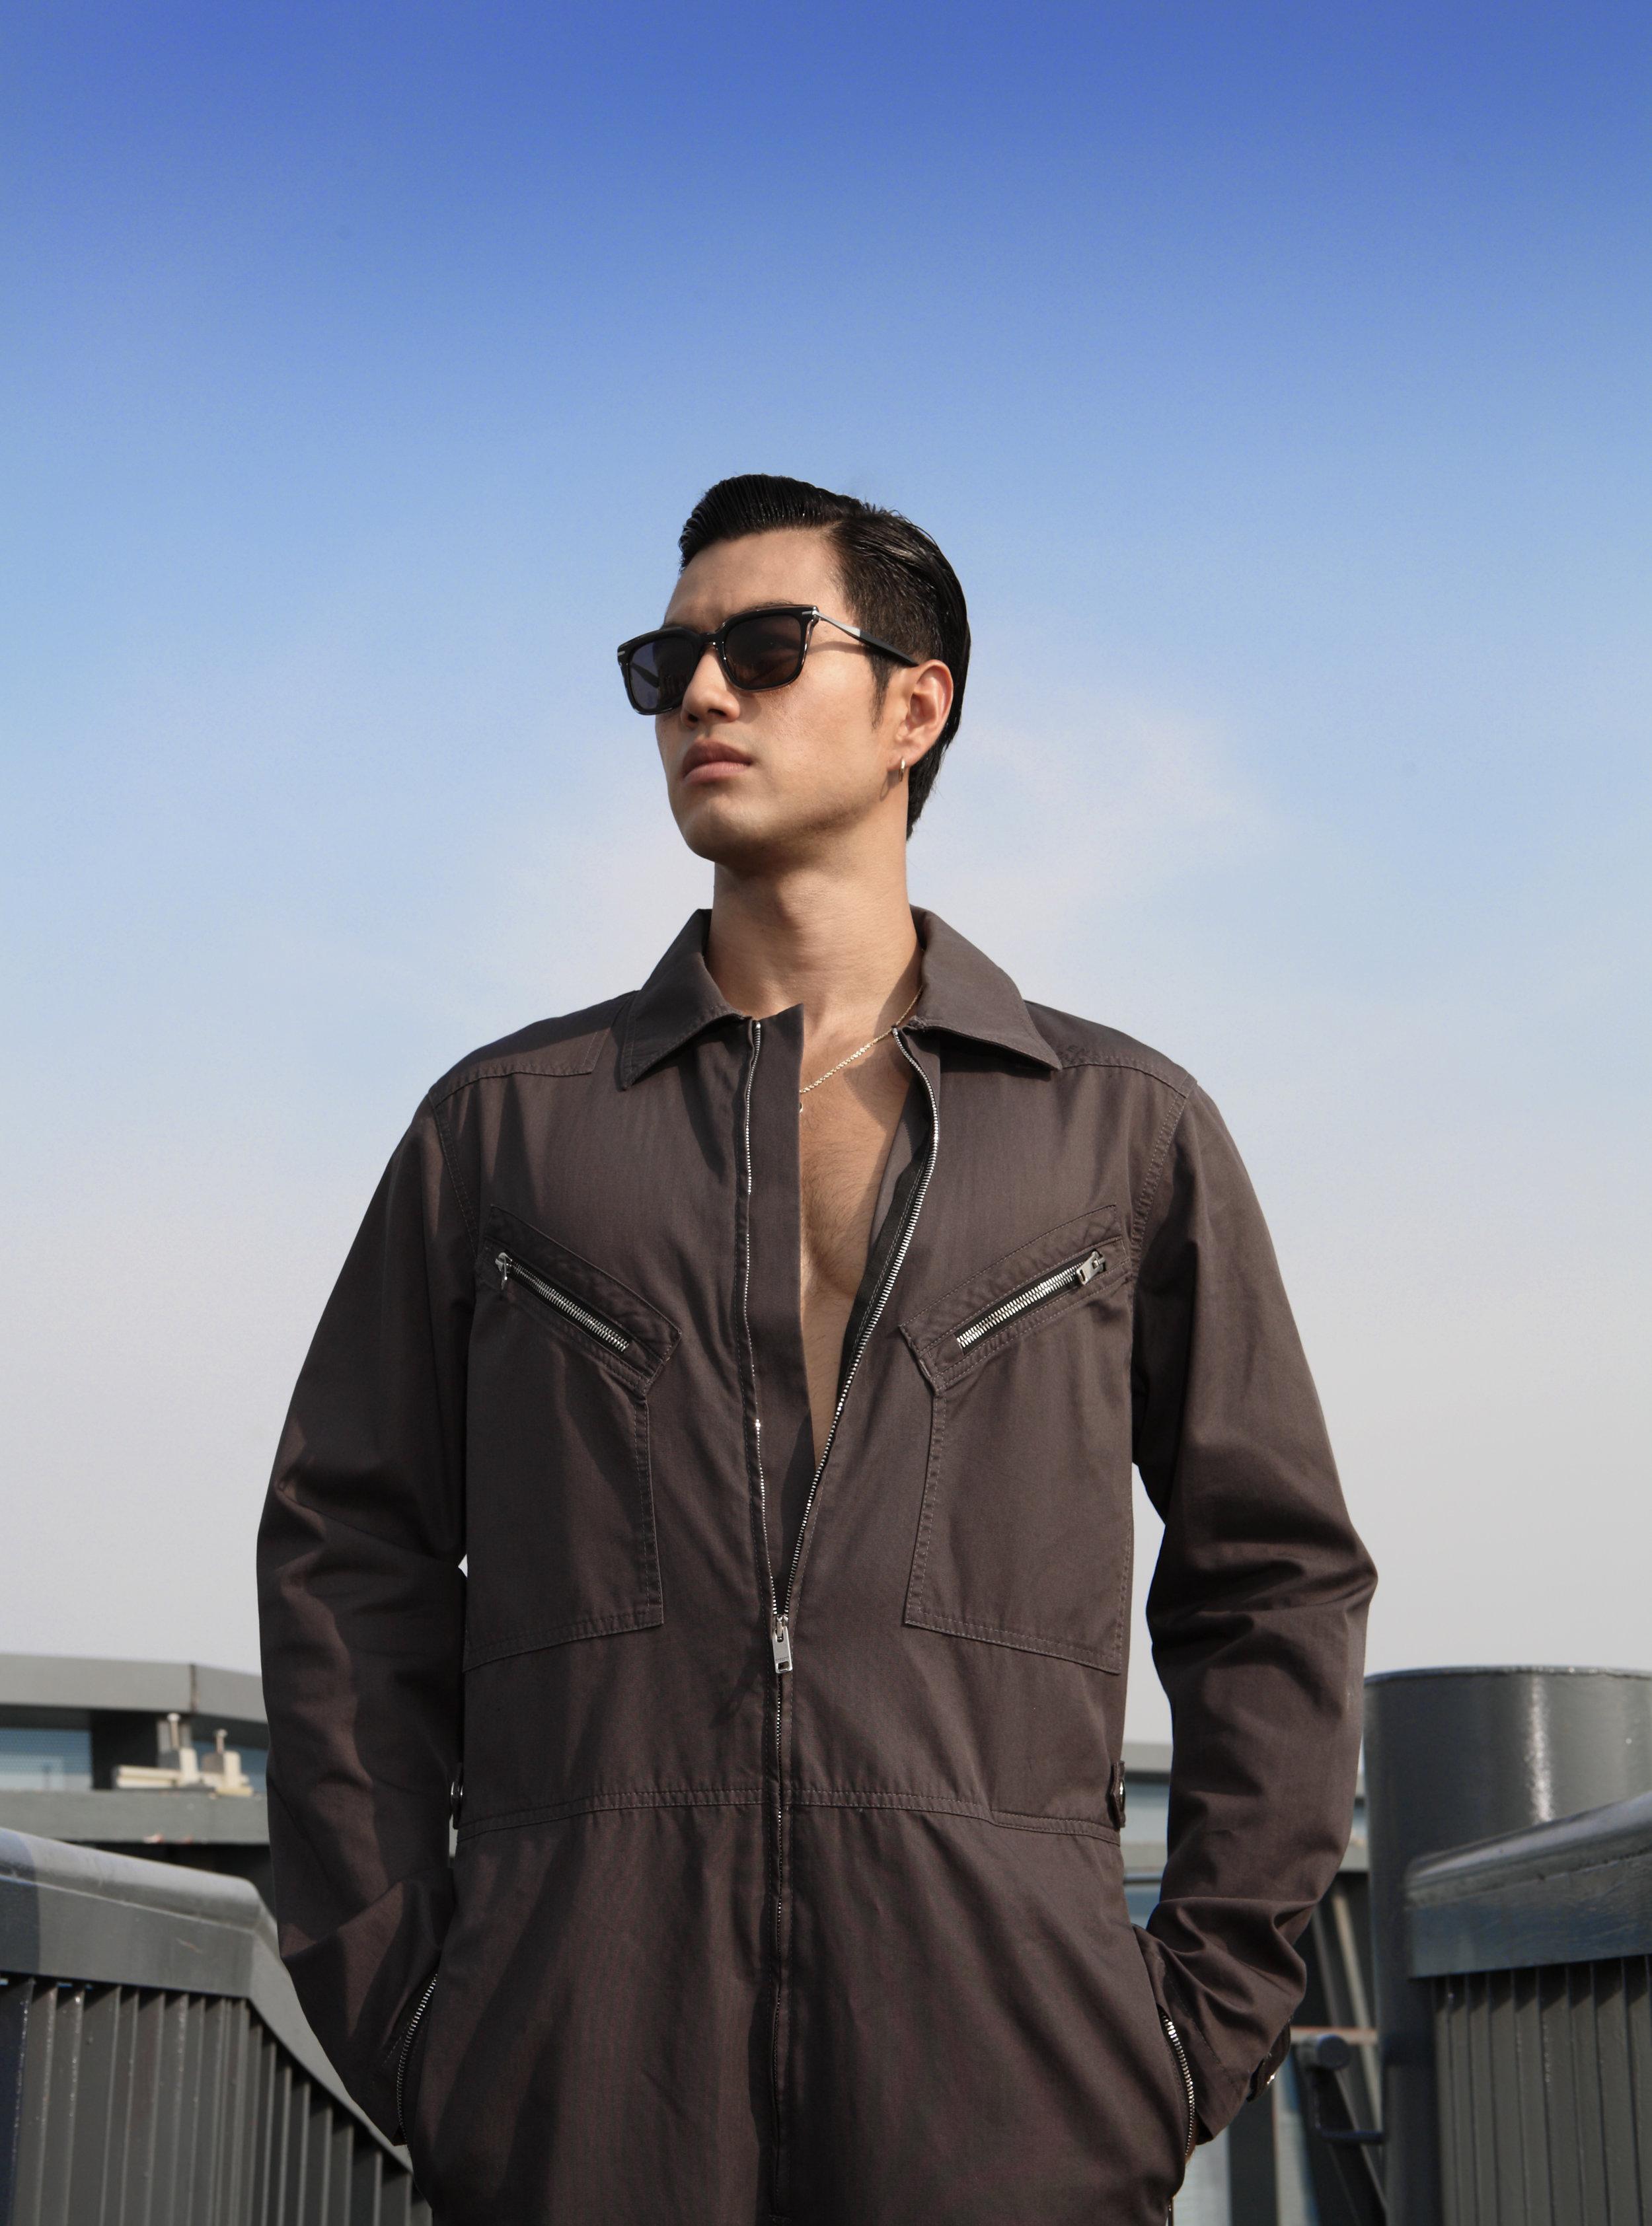 jumpsuit : GIVENCHY / sunglasses : Blake Kuwahara